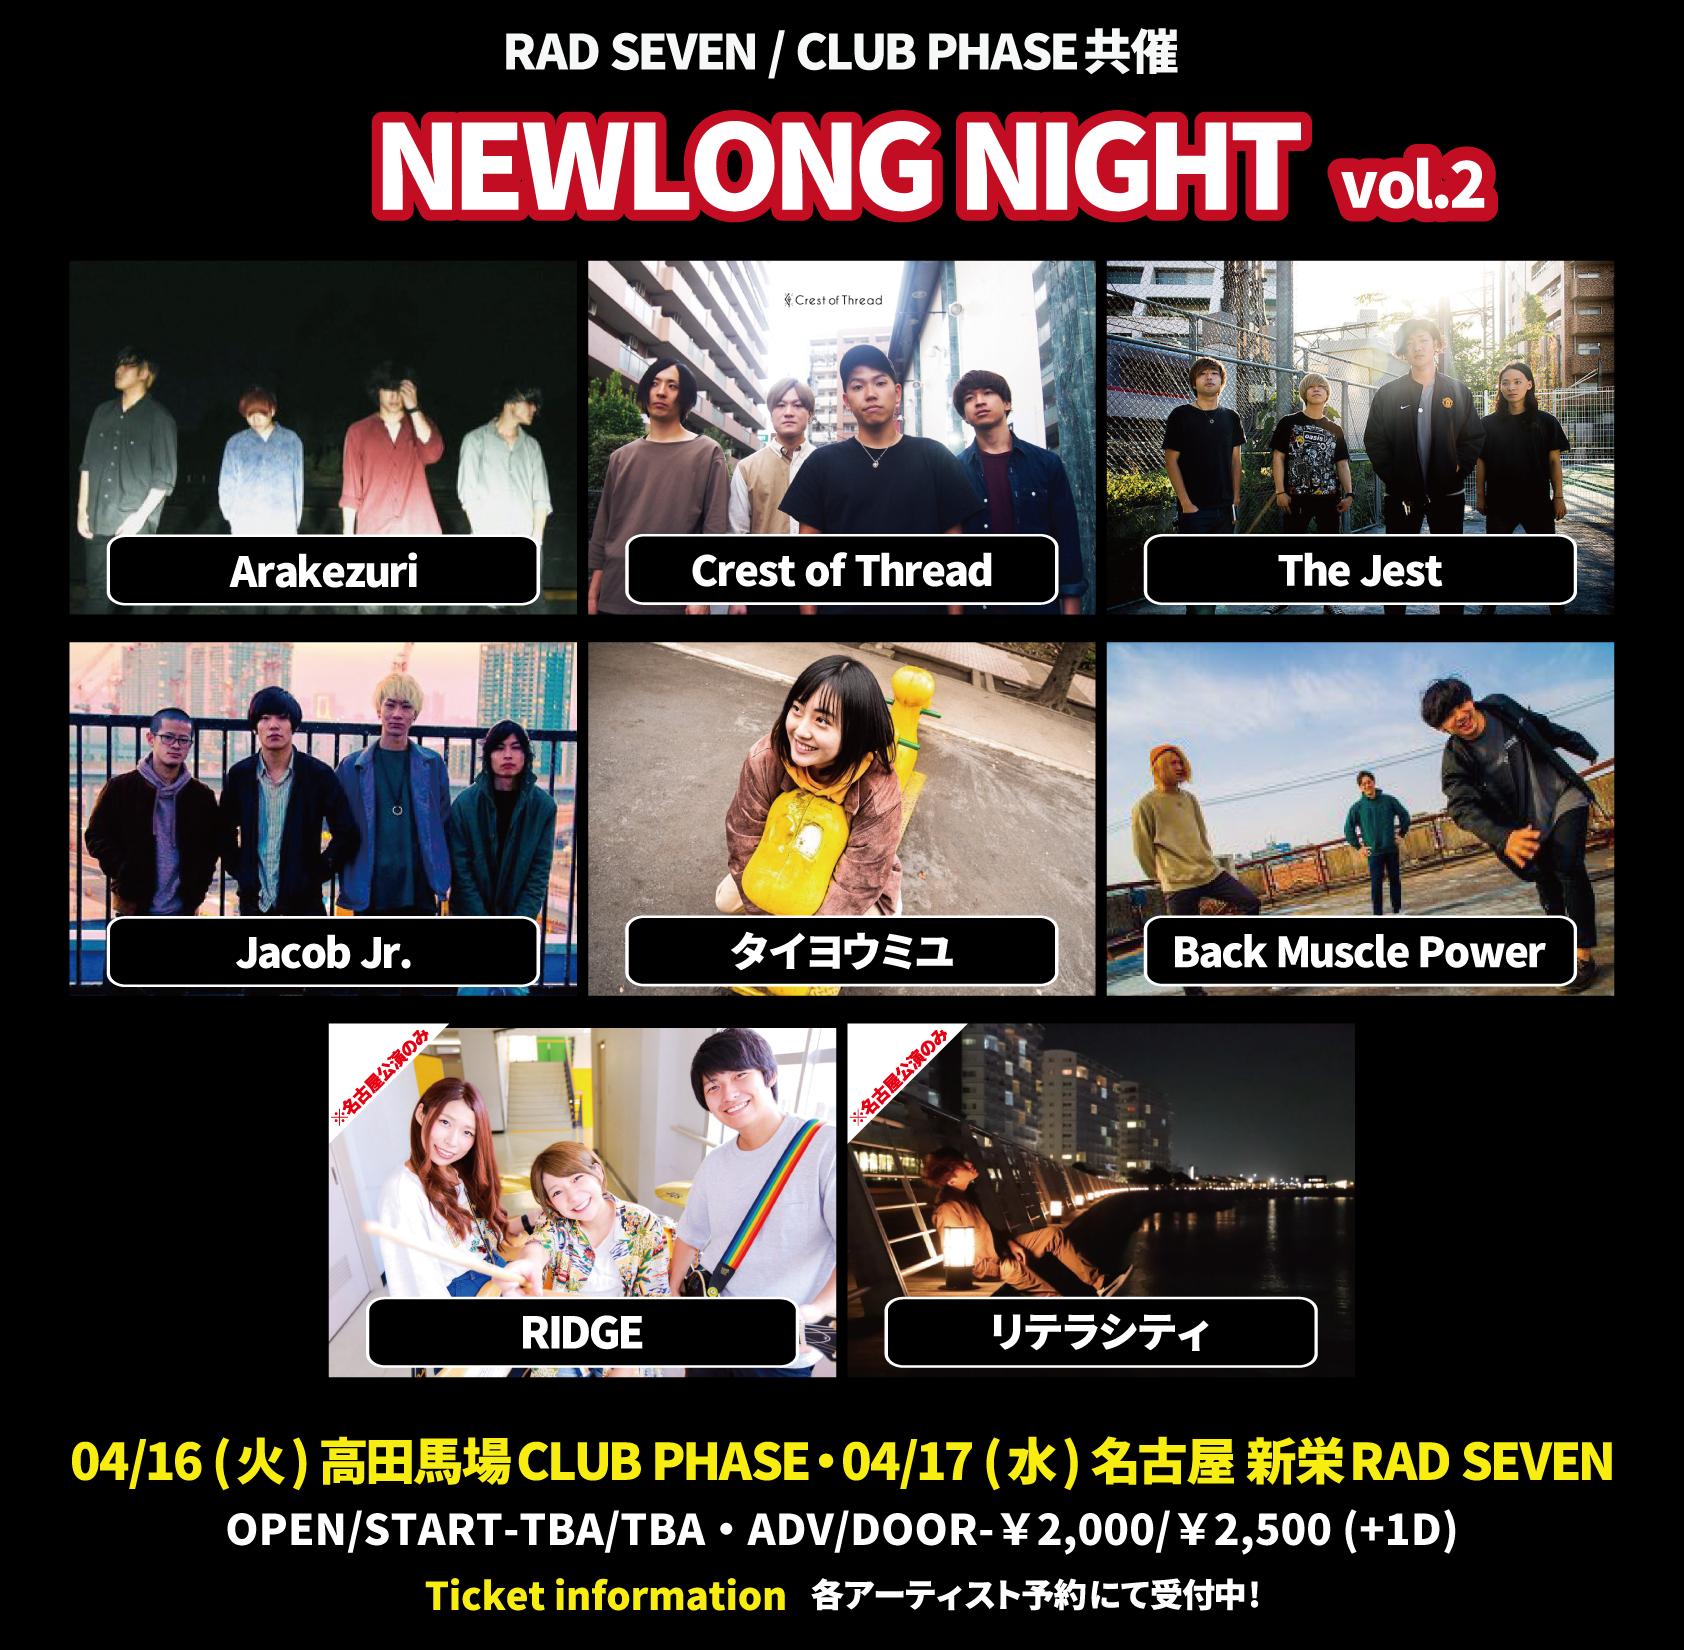 【RAD SEVEN / CLUB PHASE共催 『NEWLONG NIGHT』vol,2】